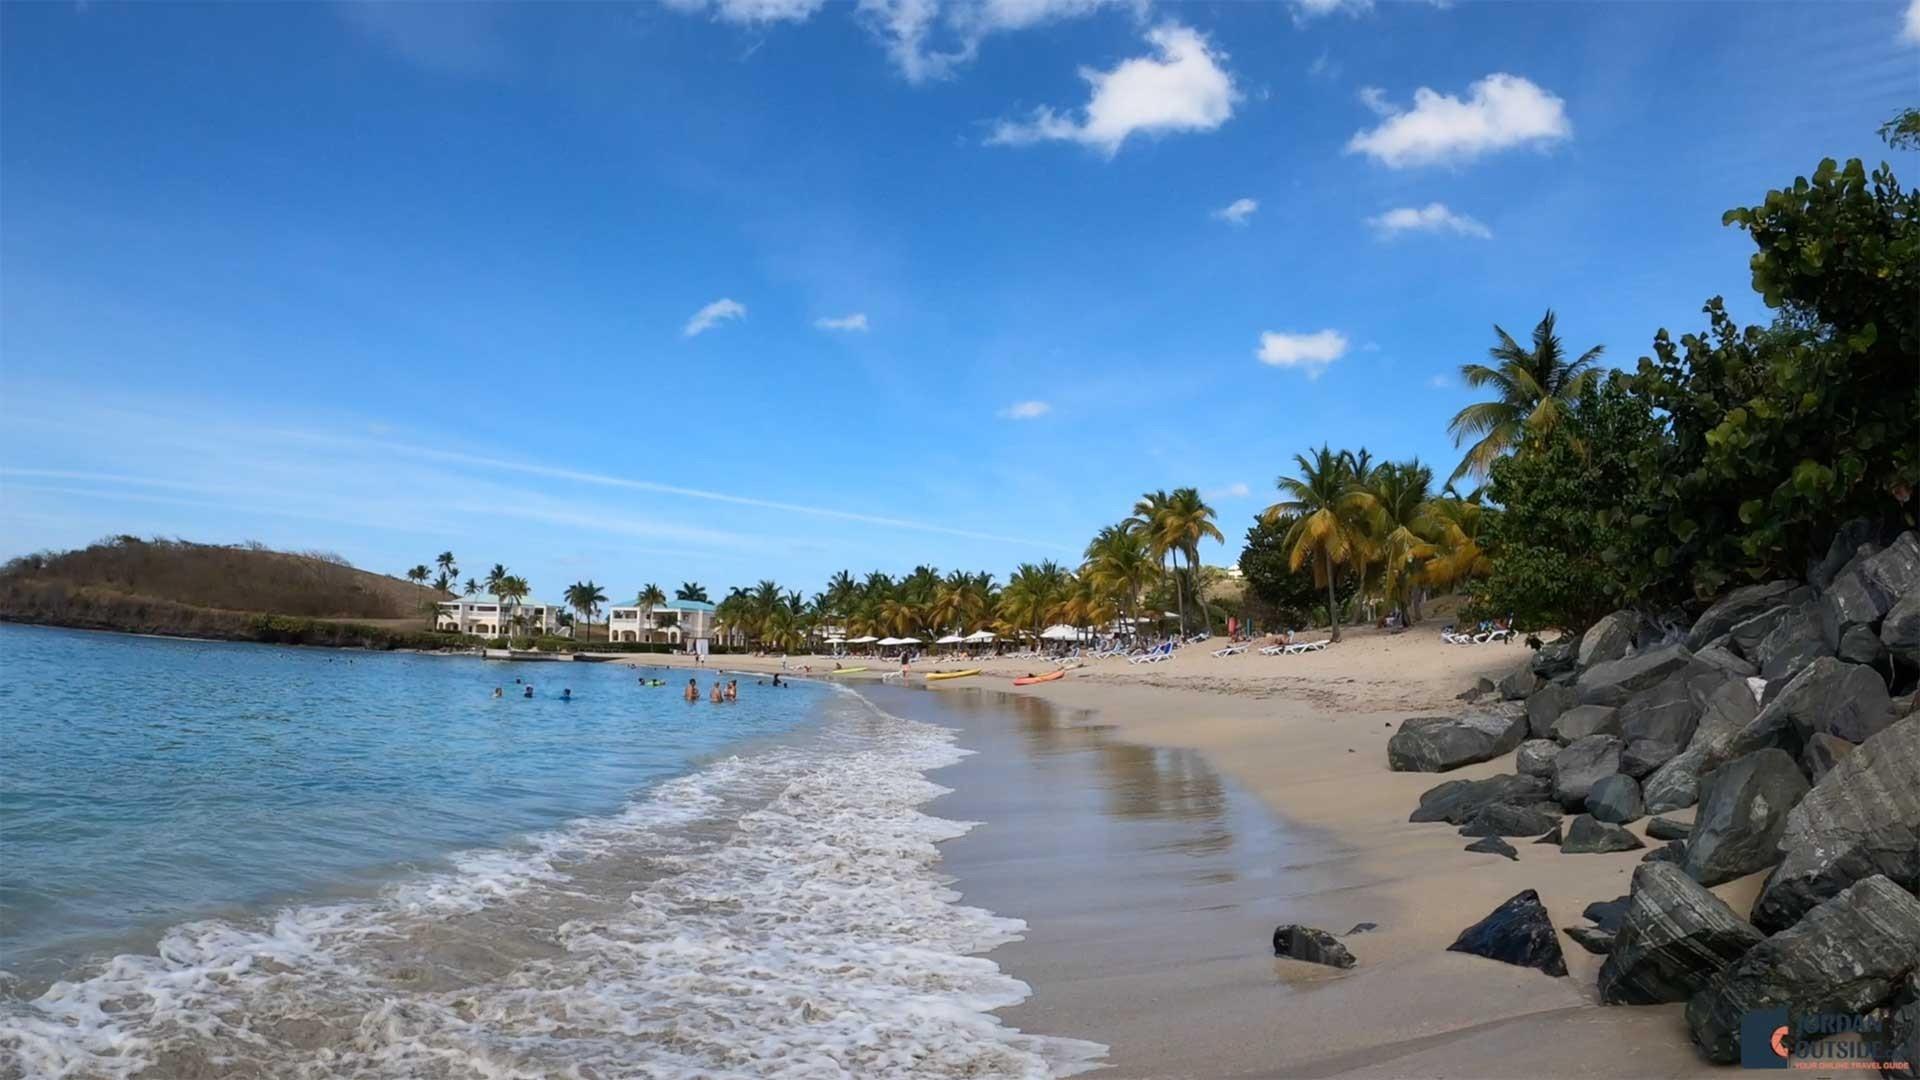 The end of Mermaid Beach in St. Croix